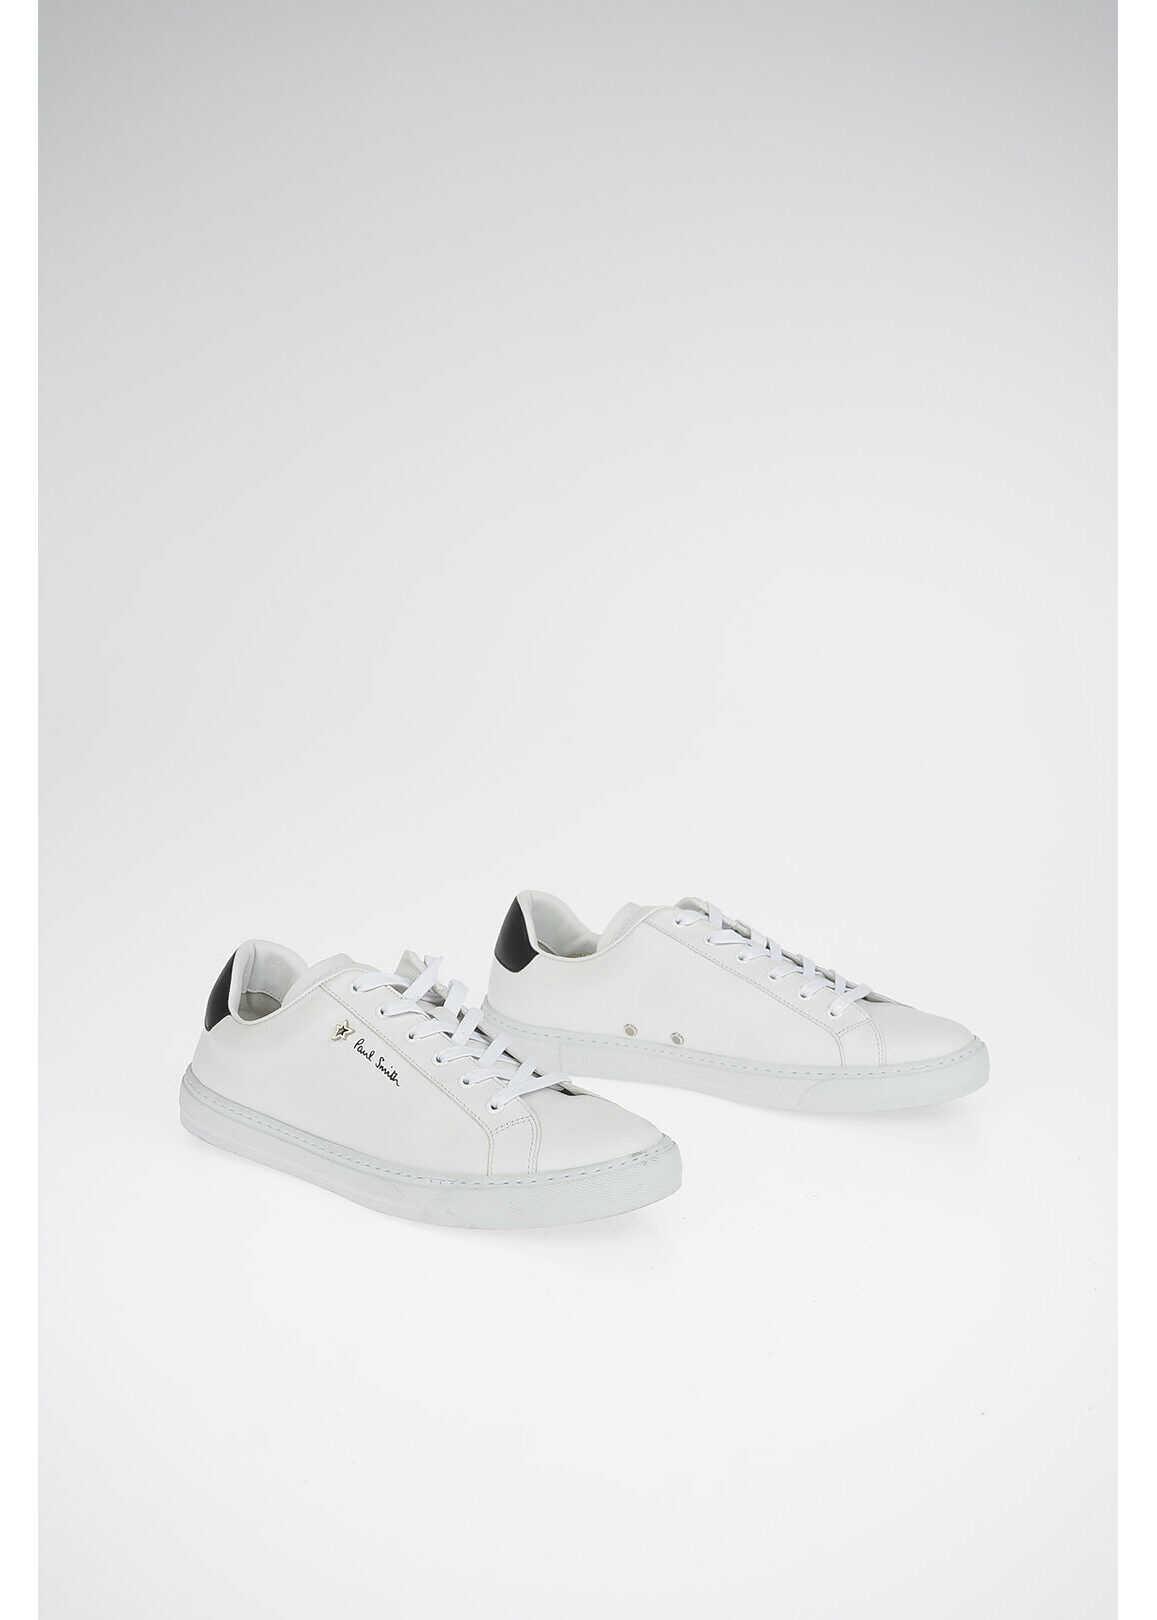 Paul Smith Leather HANSEN Sneakers WHITE